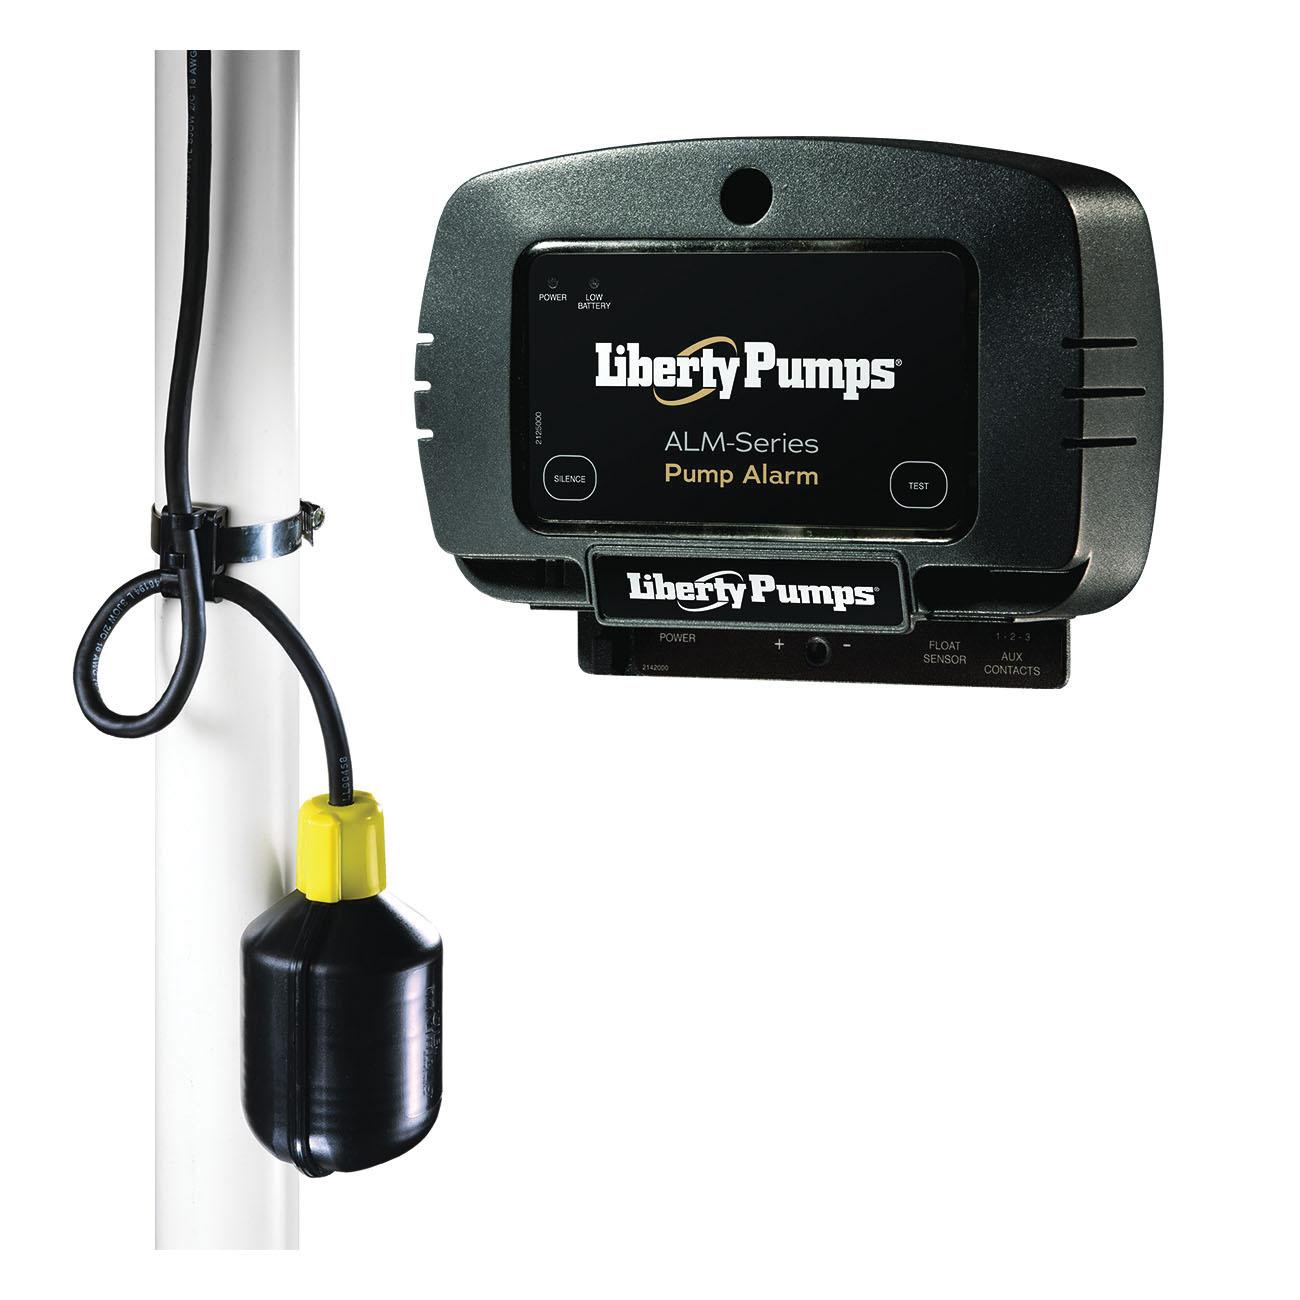 Liberty Pumps® ALM-2 High Liquid Level Alarm, 86 dB Sound, Test/Silence Switch, 115 VAC, Domestic